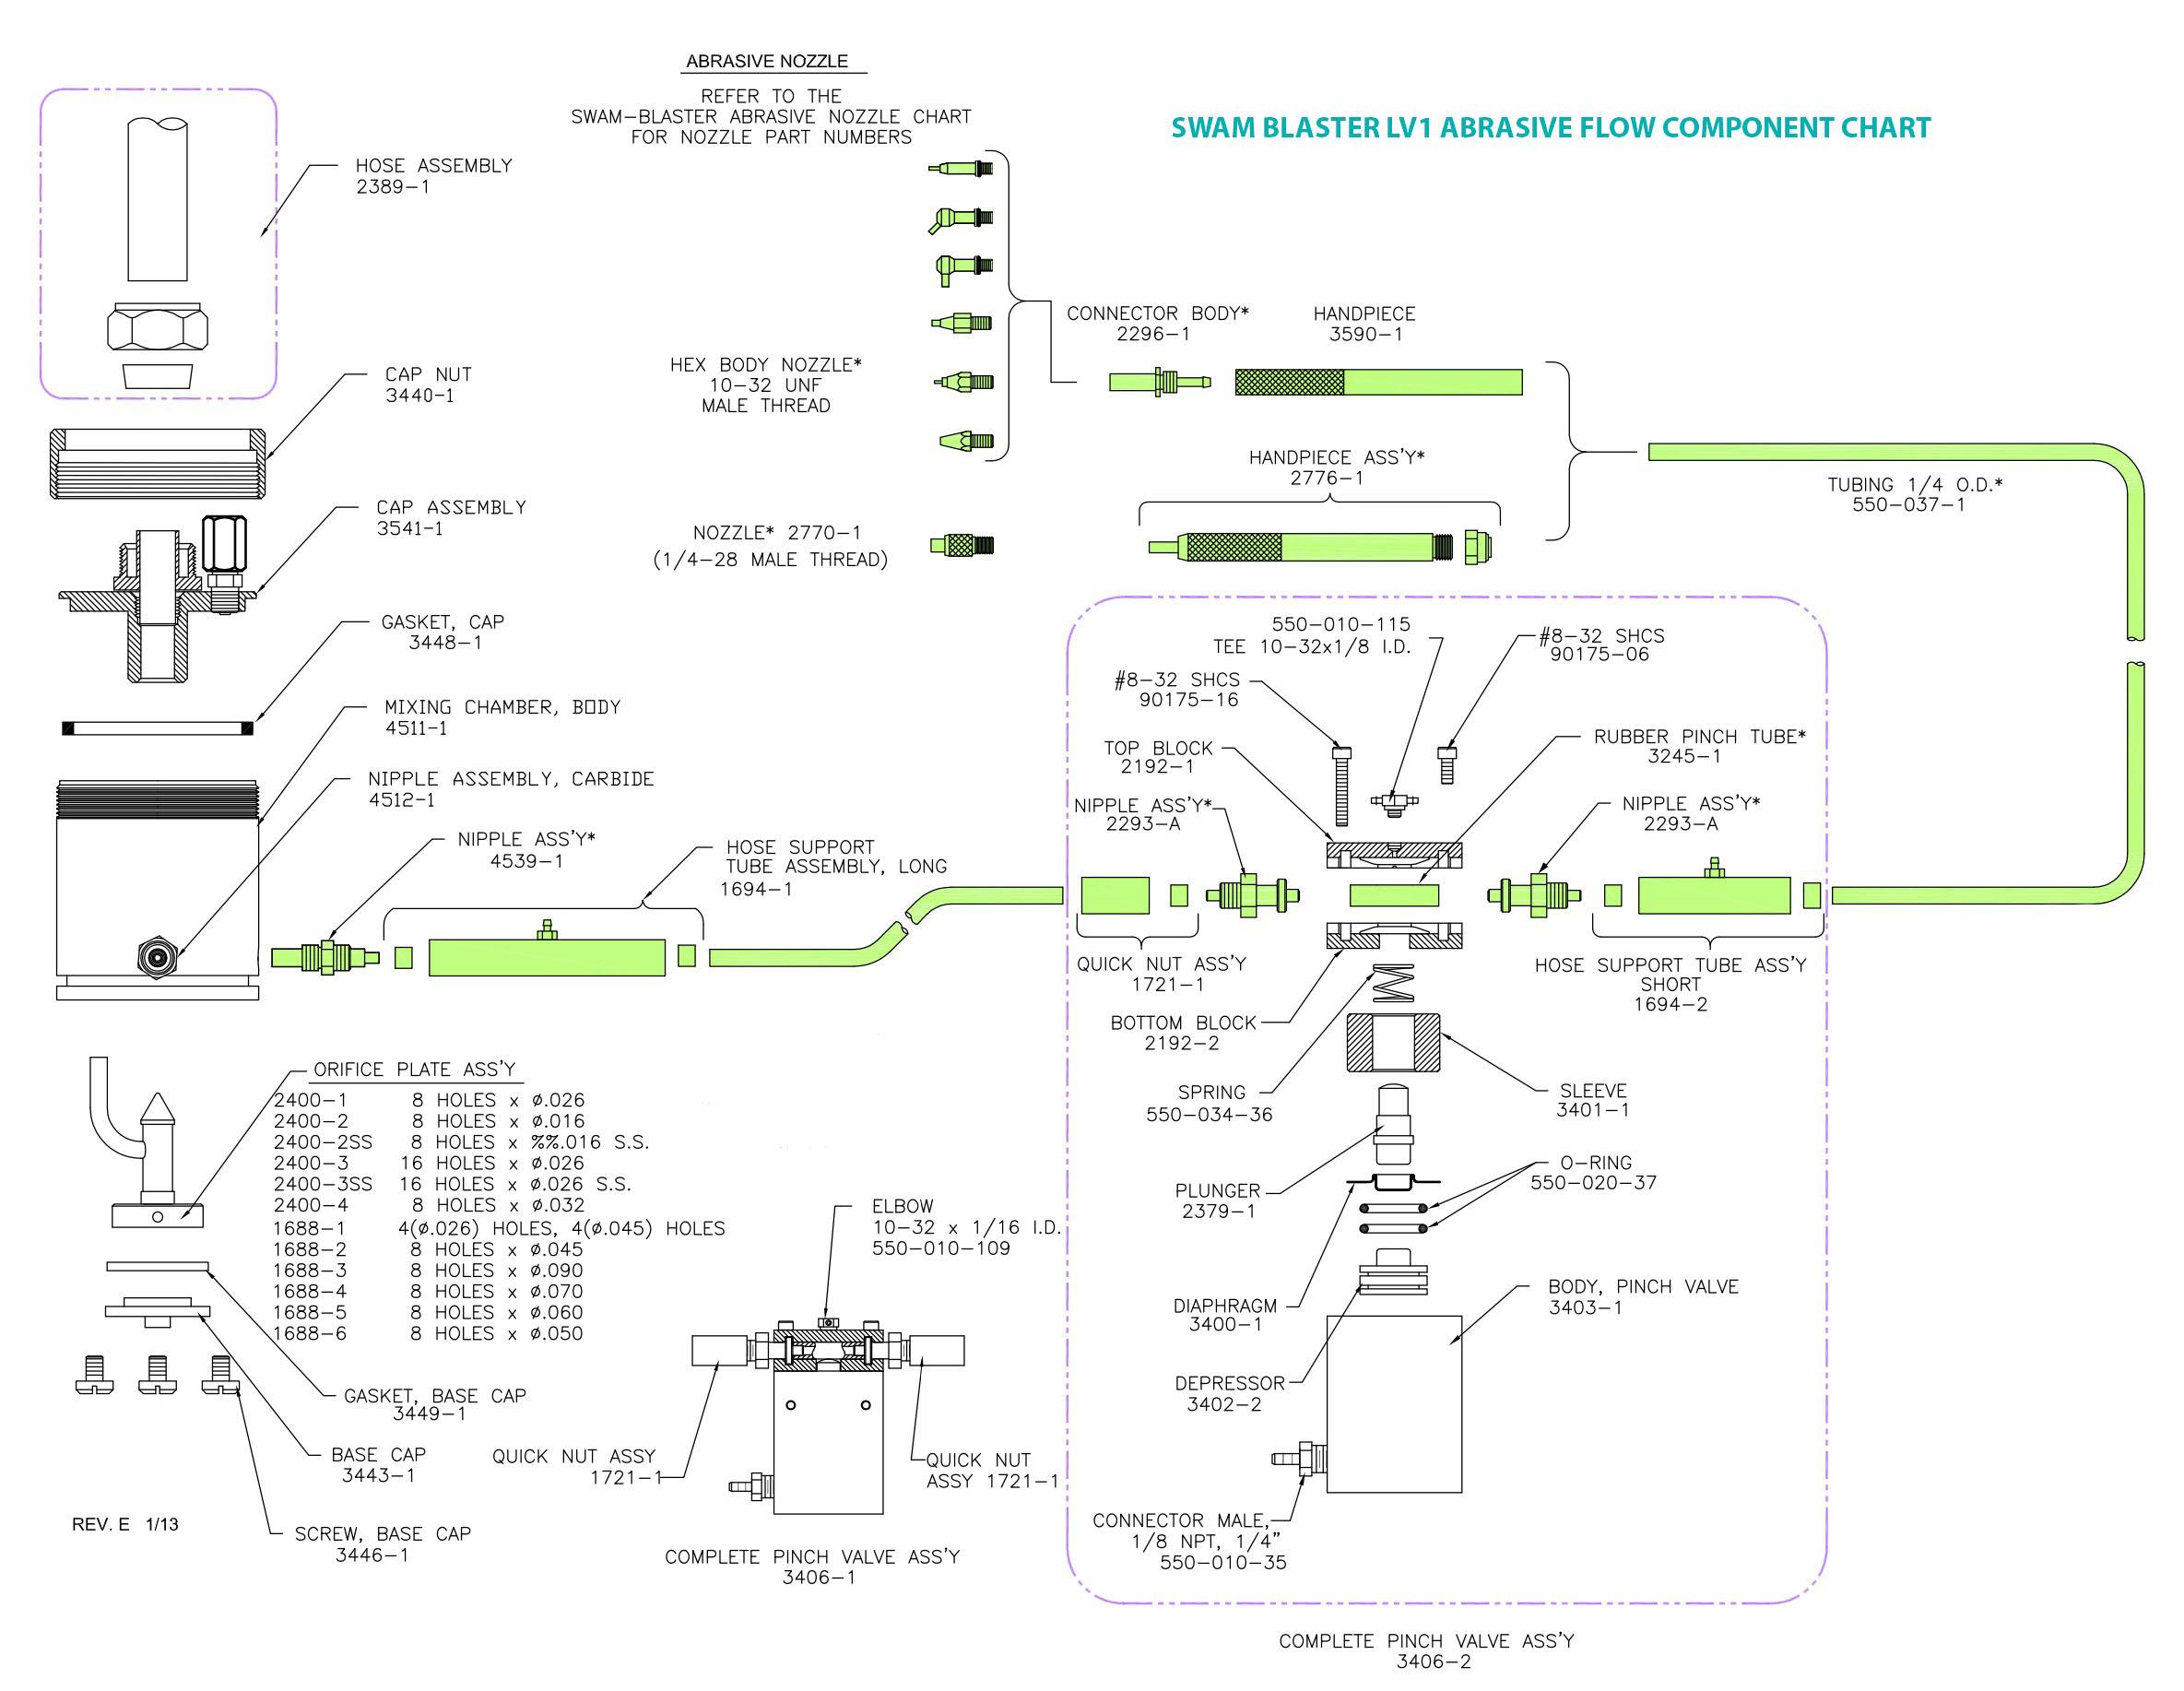 Abrasive Flow Component Chart for LV1 SWAM BLASTER